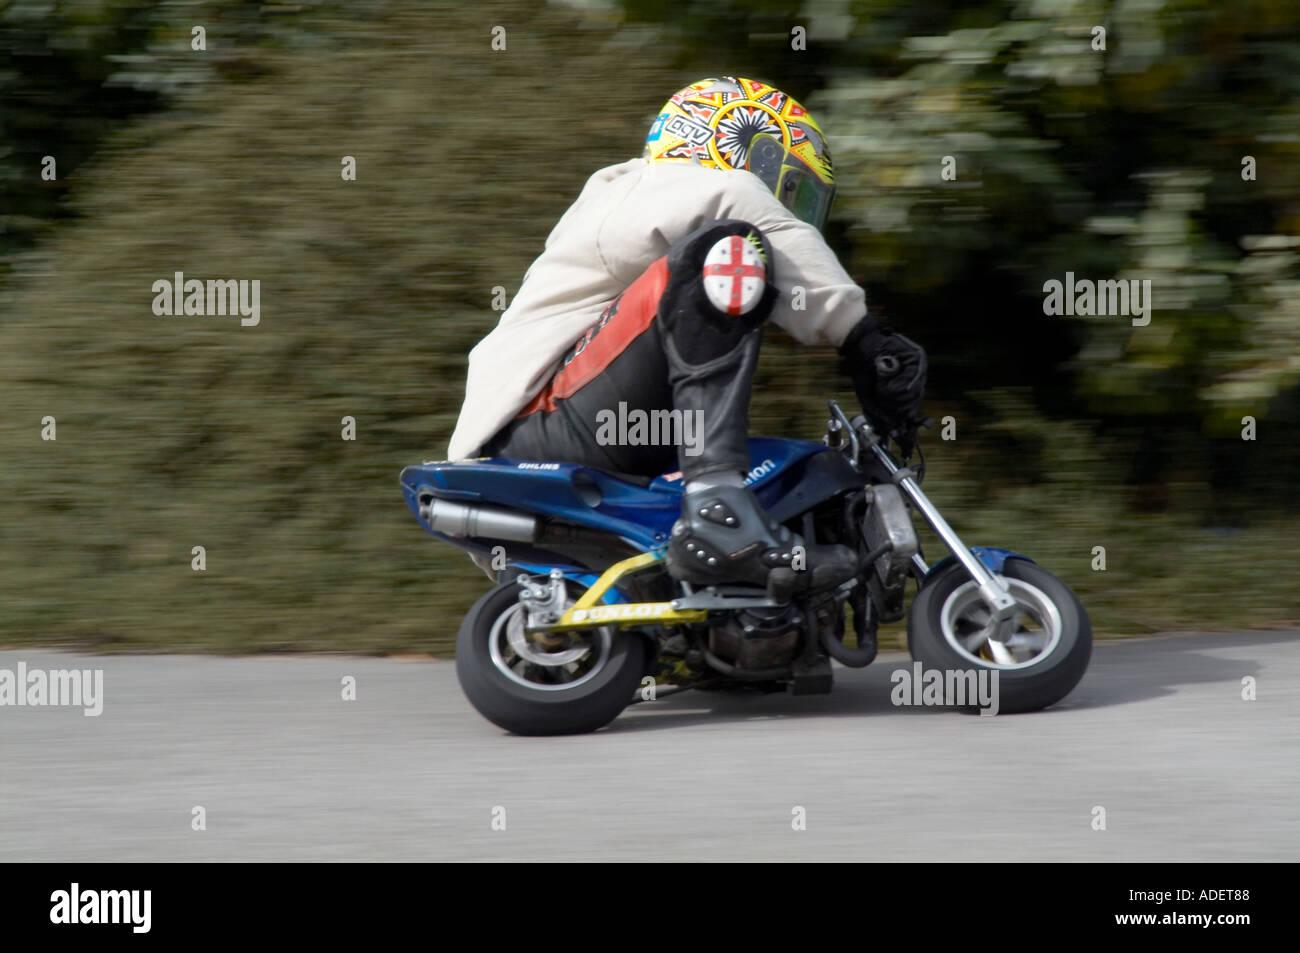 Mini Moto Motor Cycle Motorcycle Bike Motor Bike Small Tiny Ride Rider  Riding Mini Miniature Man Ideas